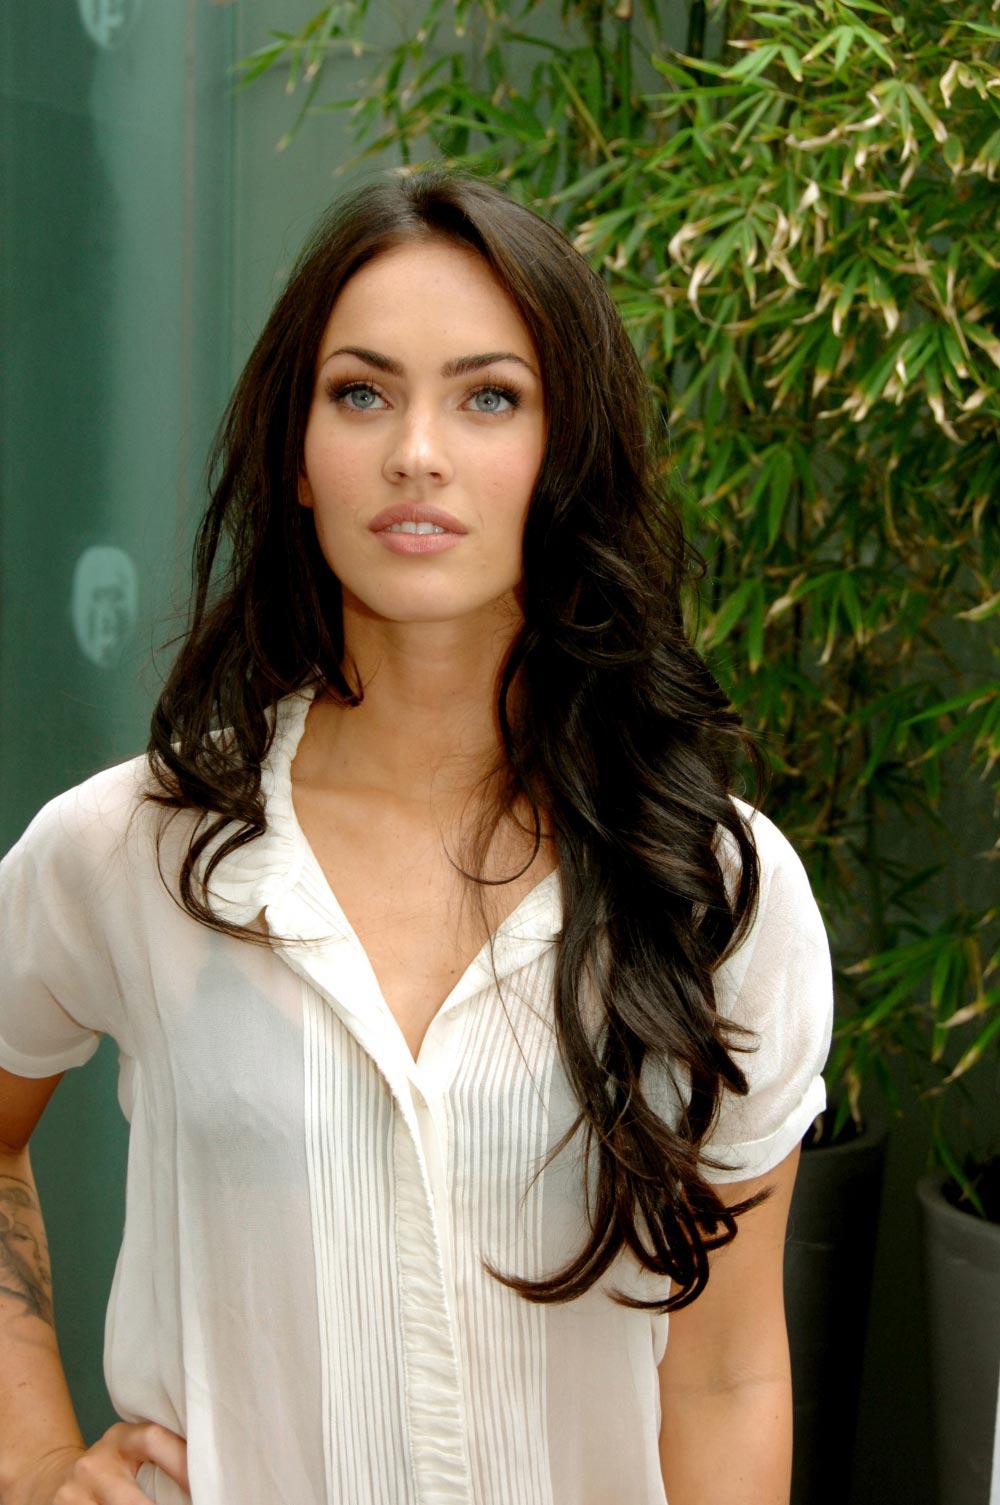 Megan Fox Wishes To Star In Lost Boys Remake Filmofilia